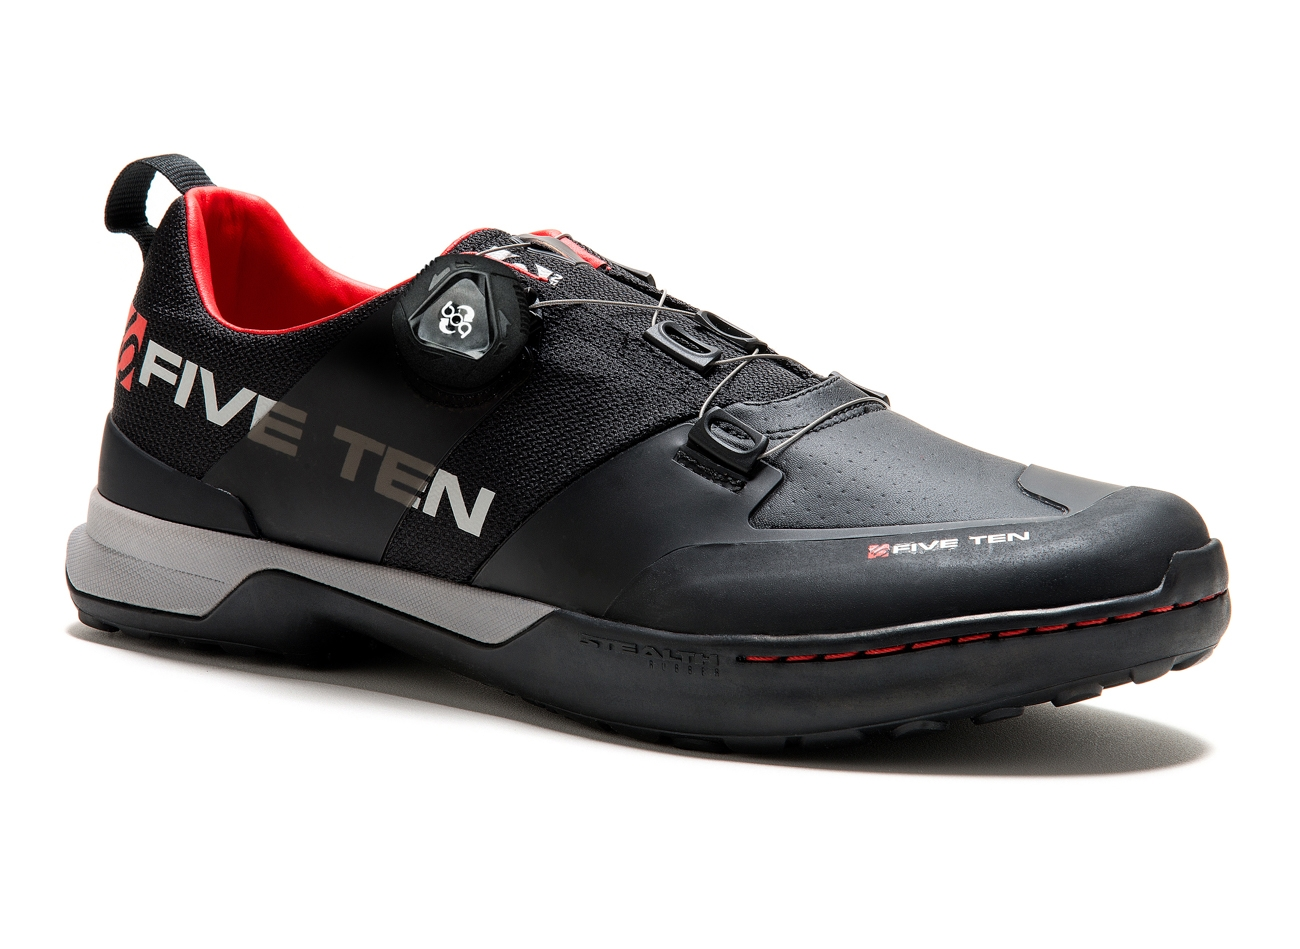 Chaussures Five Ten Kestrel Team Boa Noir - UK-9.0 (43.0)